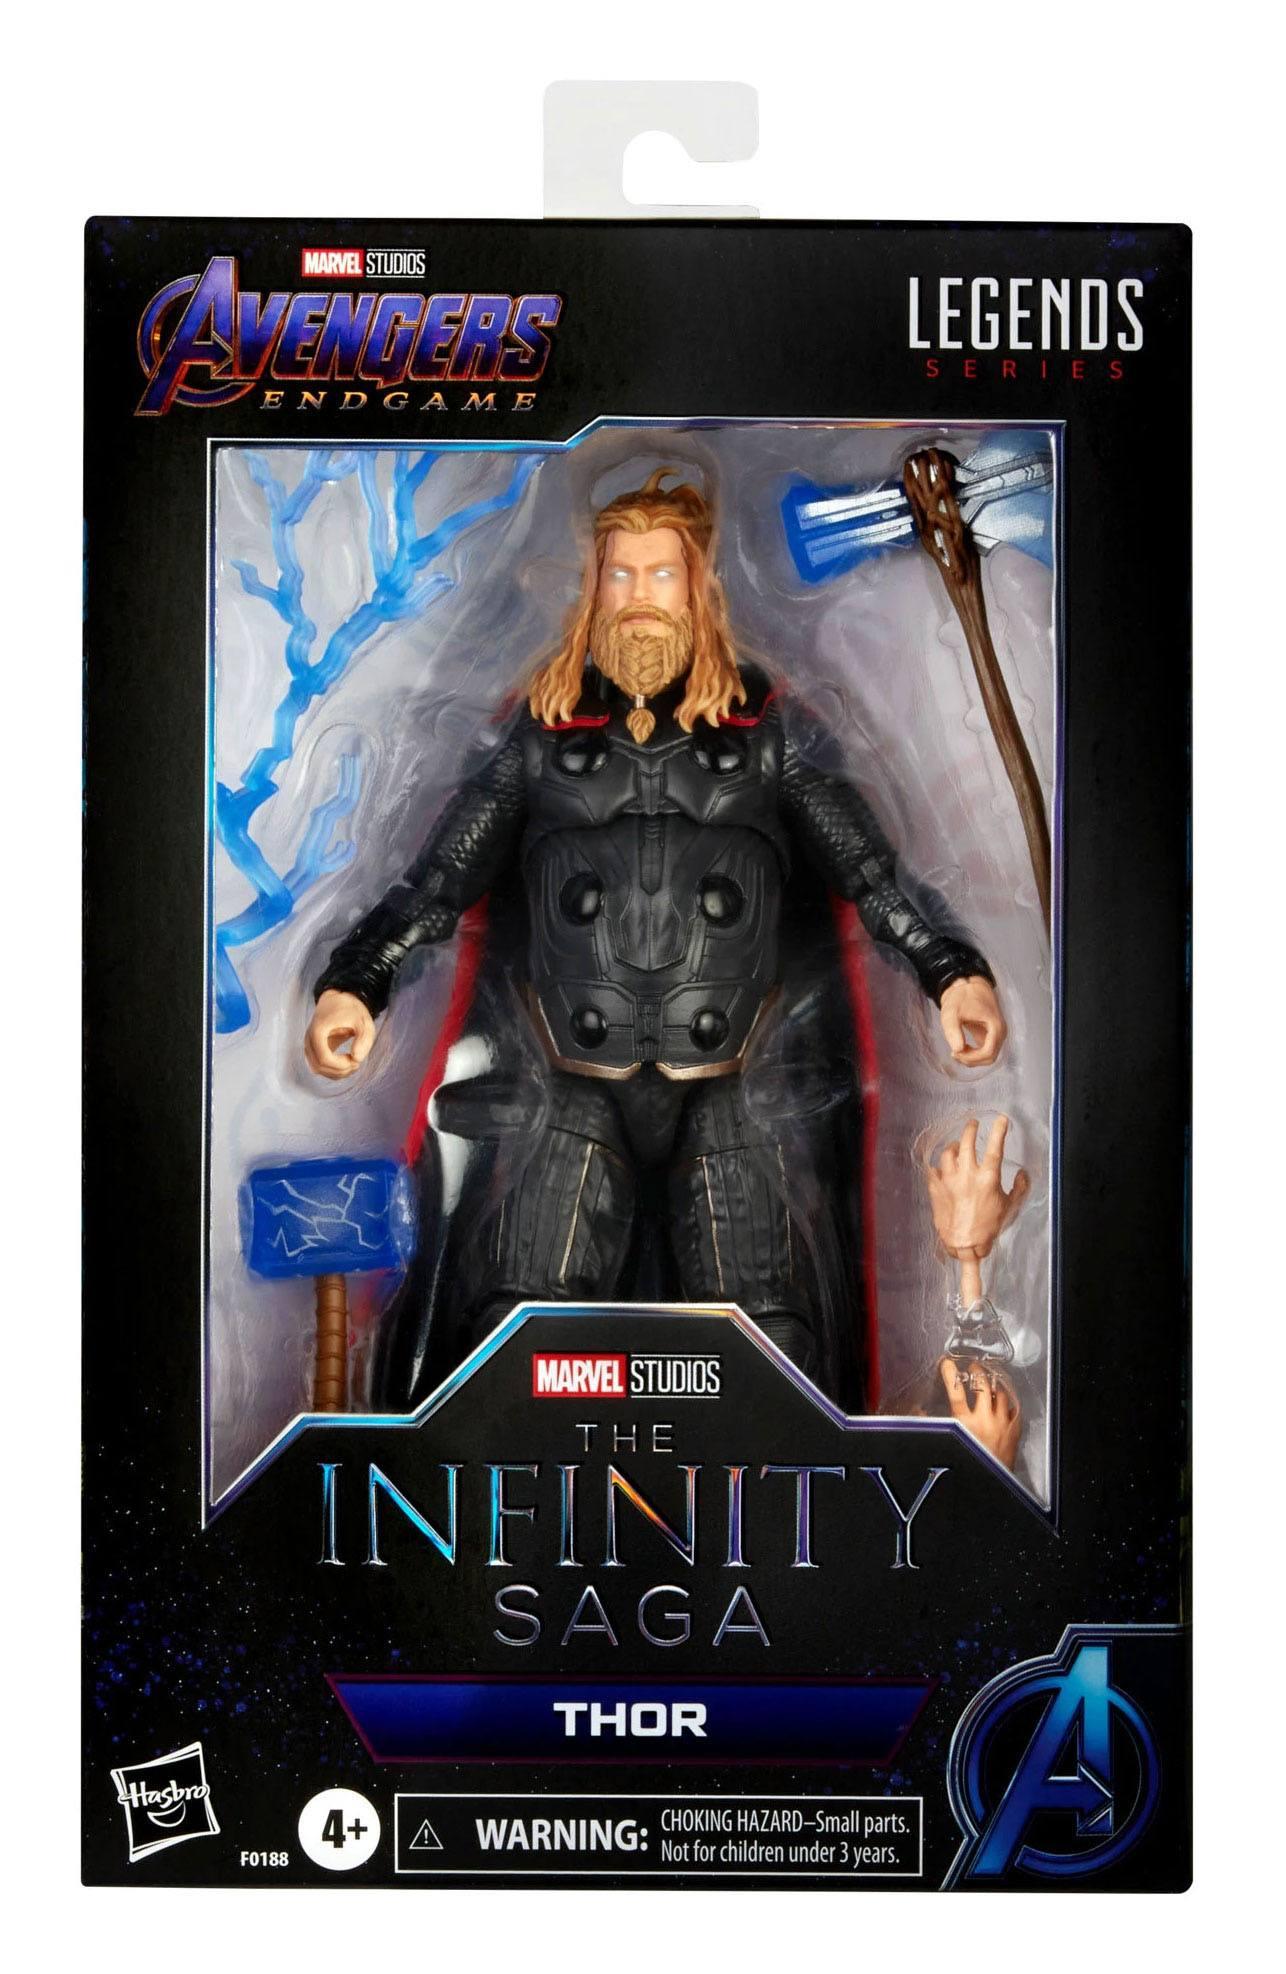 The Infinity Saga Marvel Legends Series Actionfigur 2021 Thor (Avengers: Endgame) 15 cm F01885L00 5010993839414